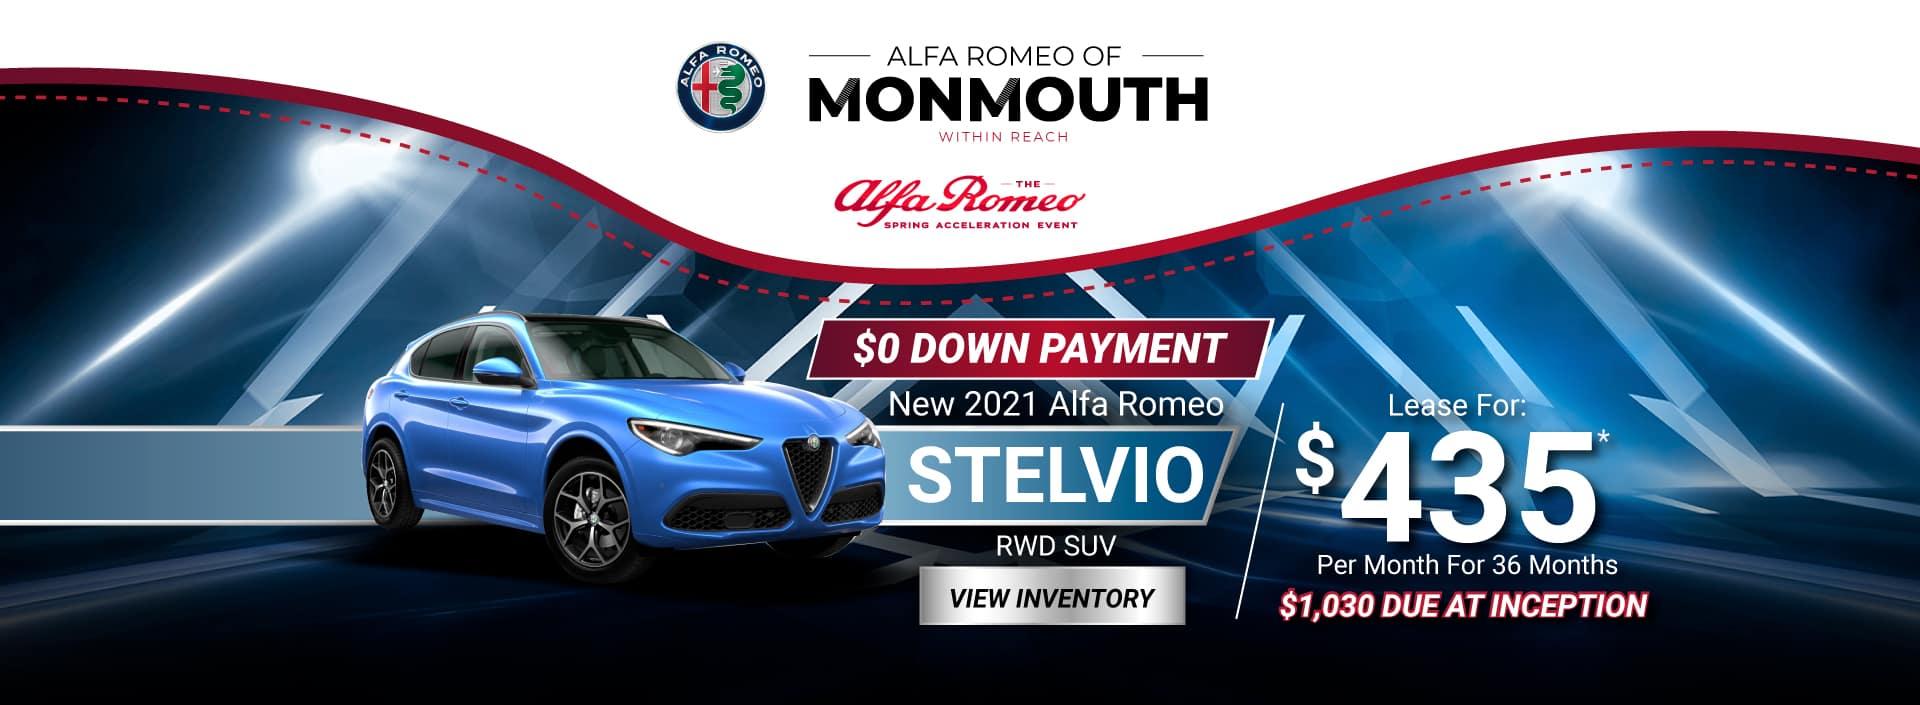 New 2021 Alfa Romeo Stelvio